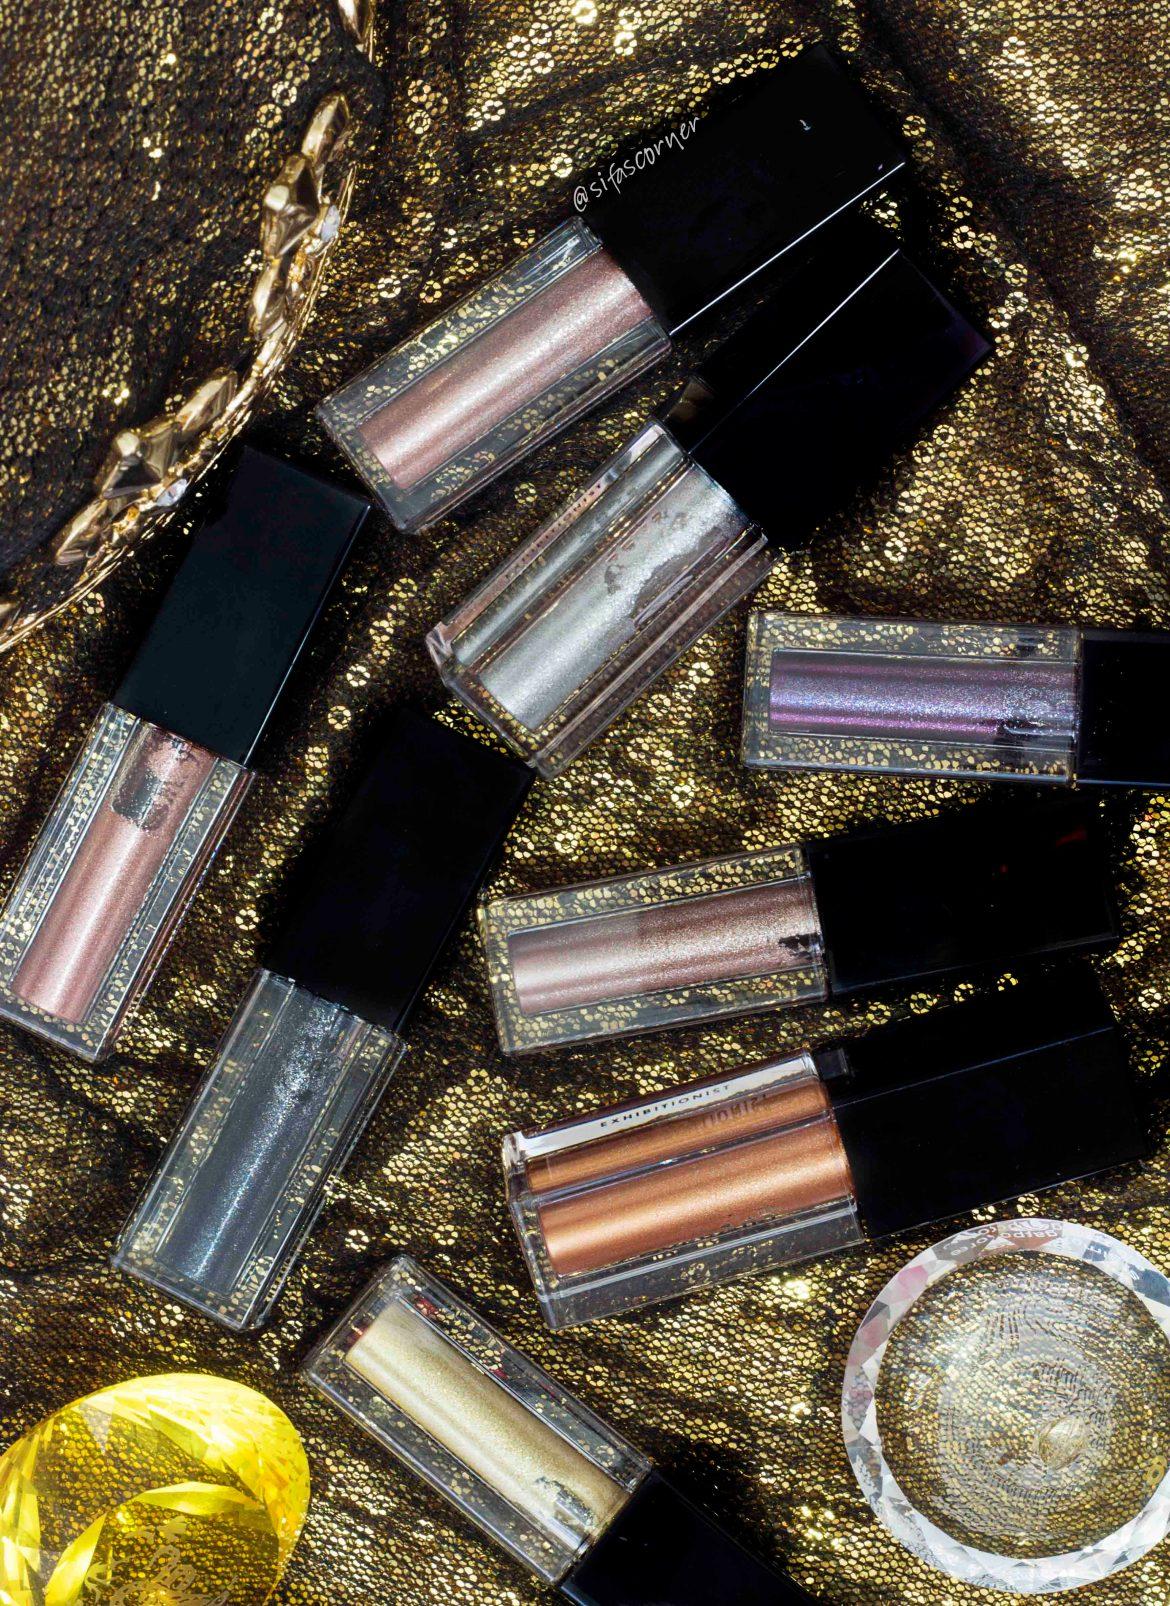 Covergirl Exhibitionist Liquid Glitter Shadow